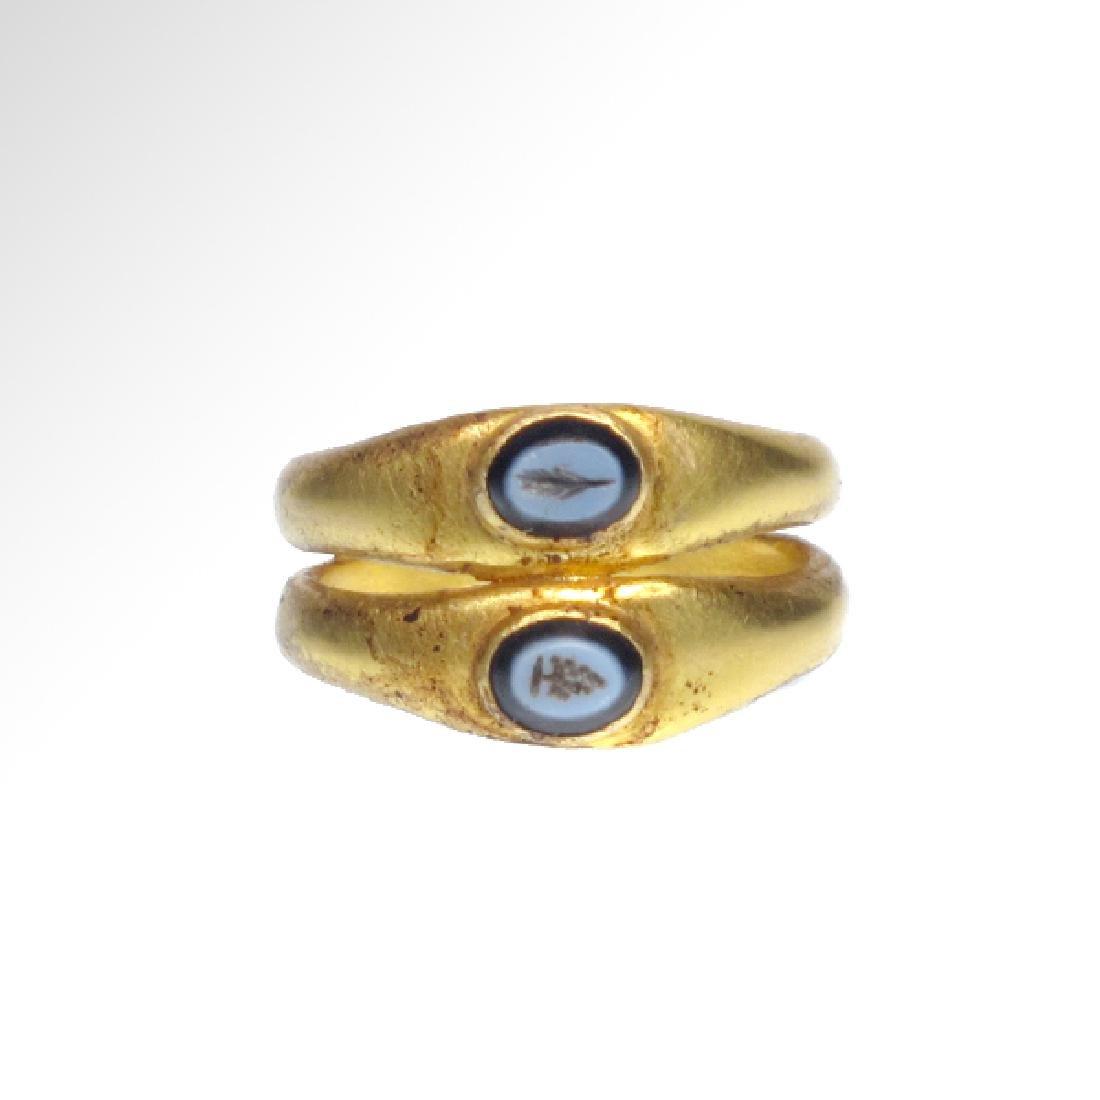 Roman Gold Double Ring, Onyx Intaglios, c. 2nd Century